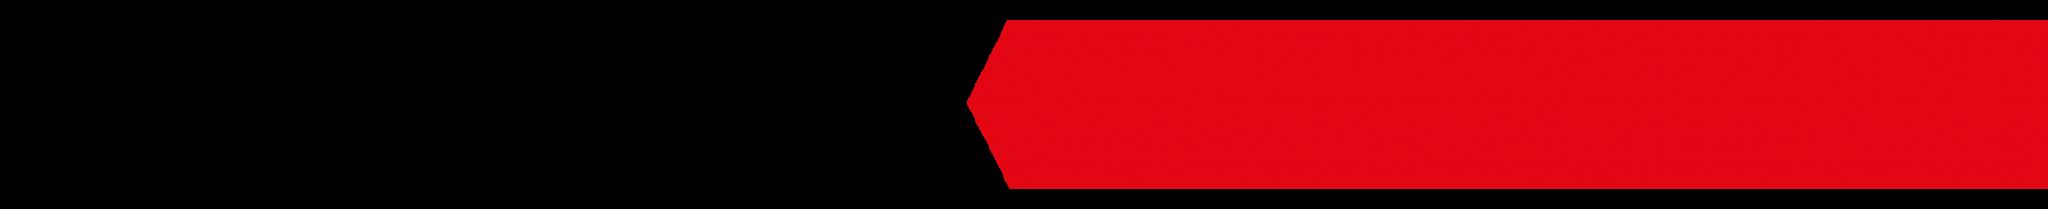 SCHWENK logo